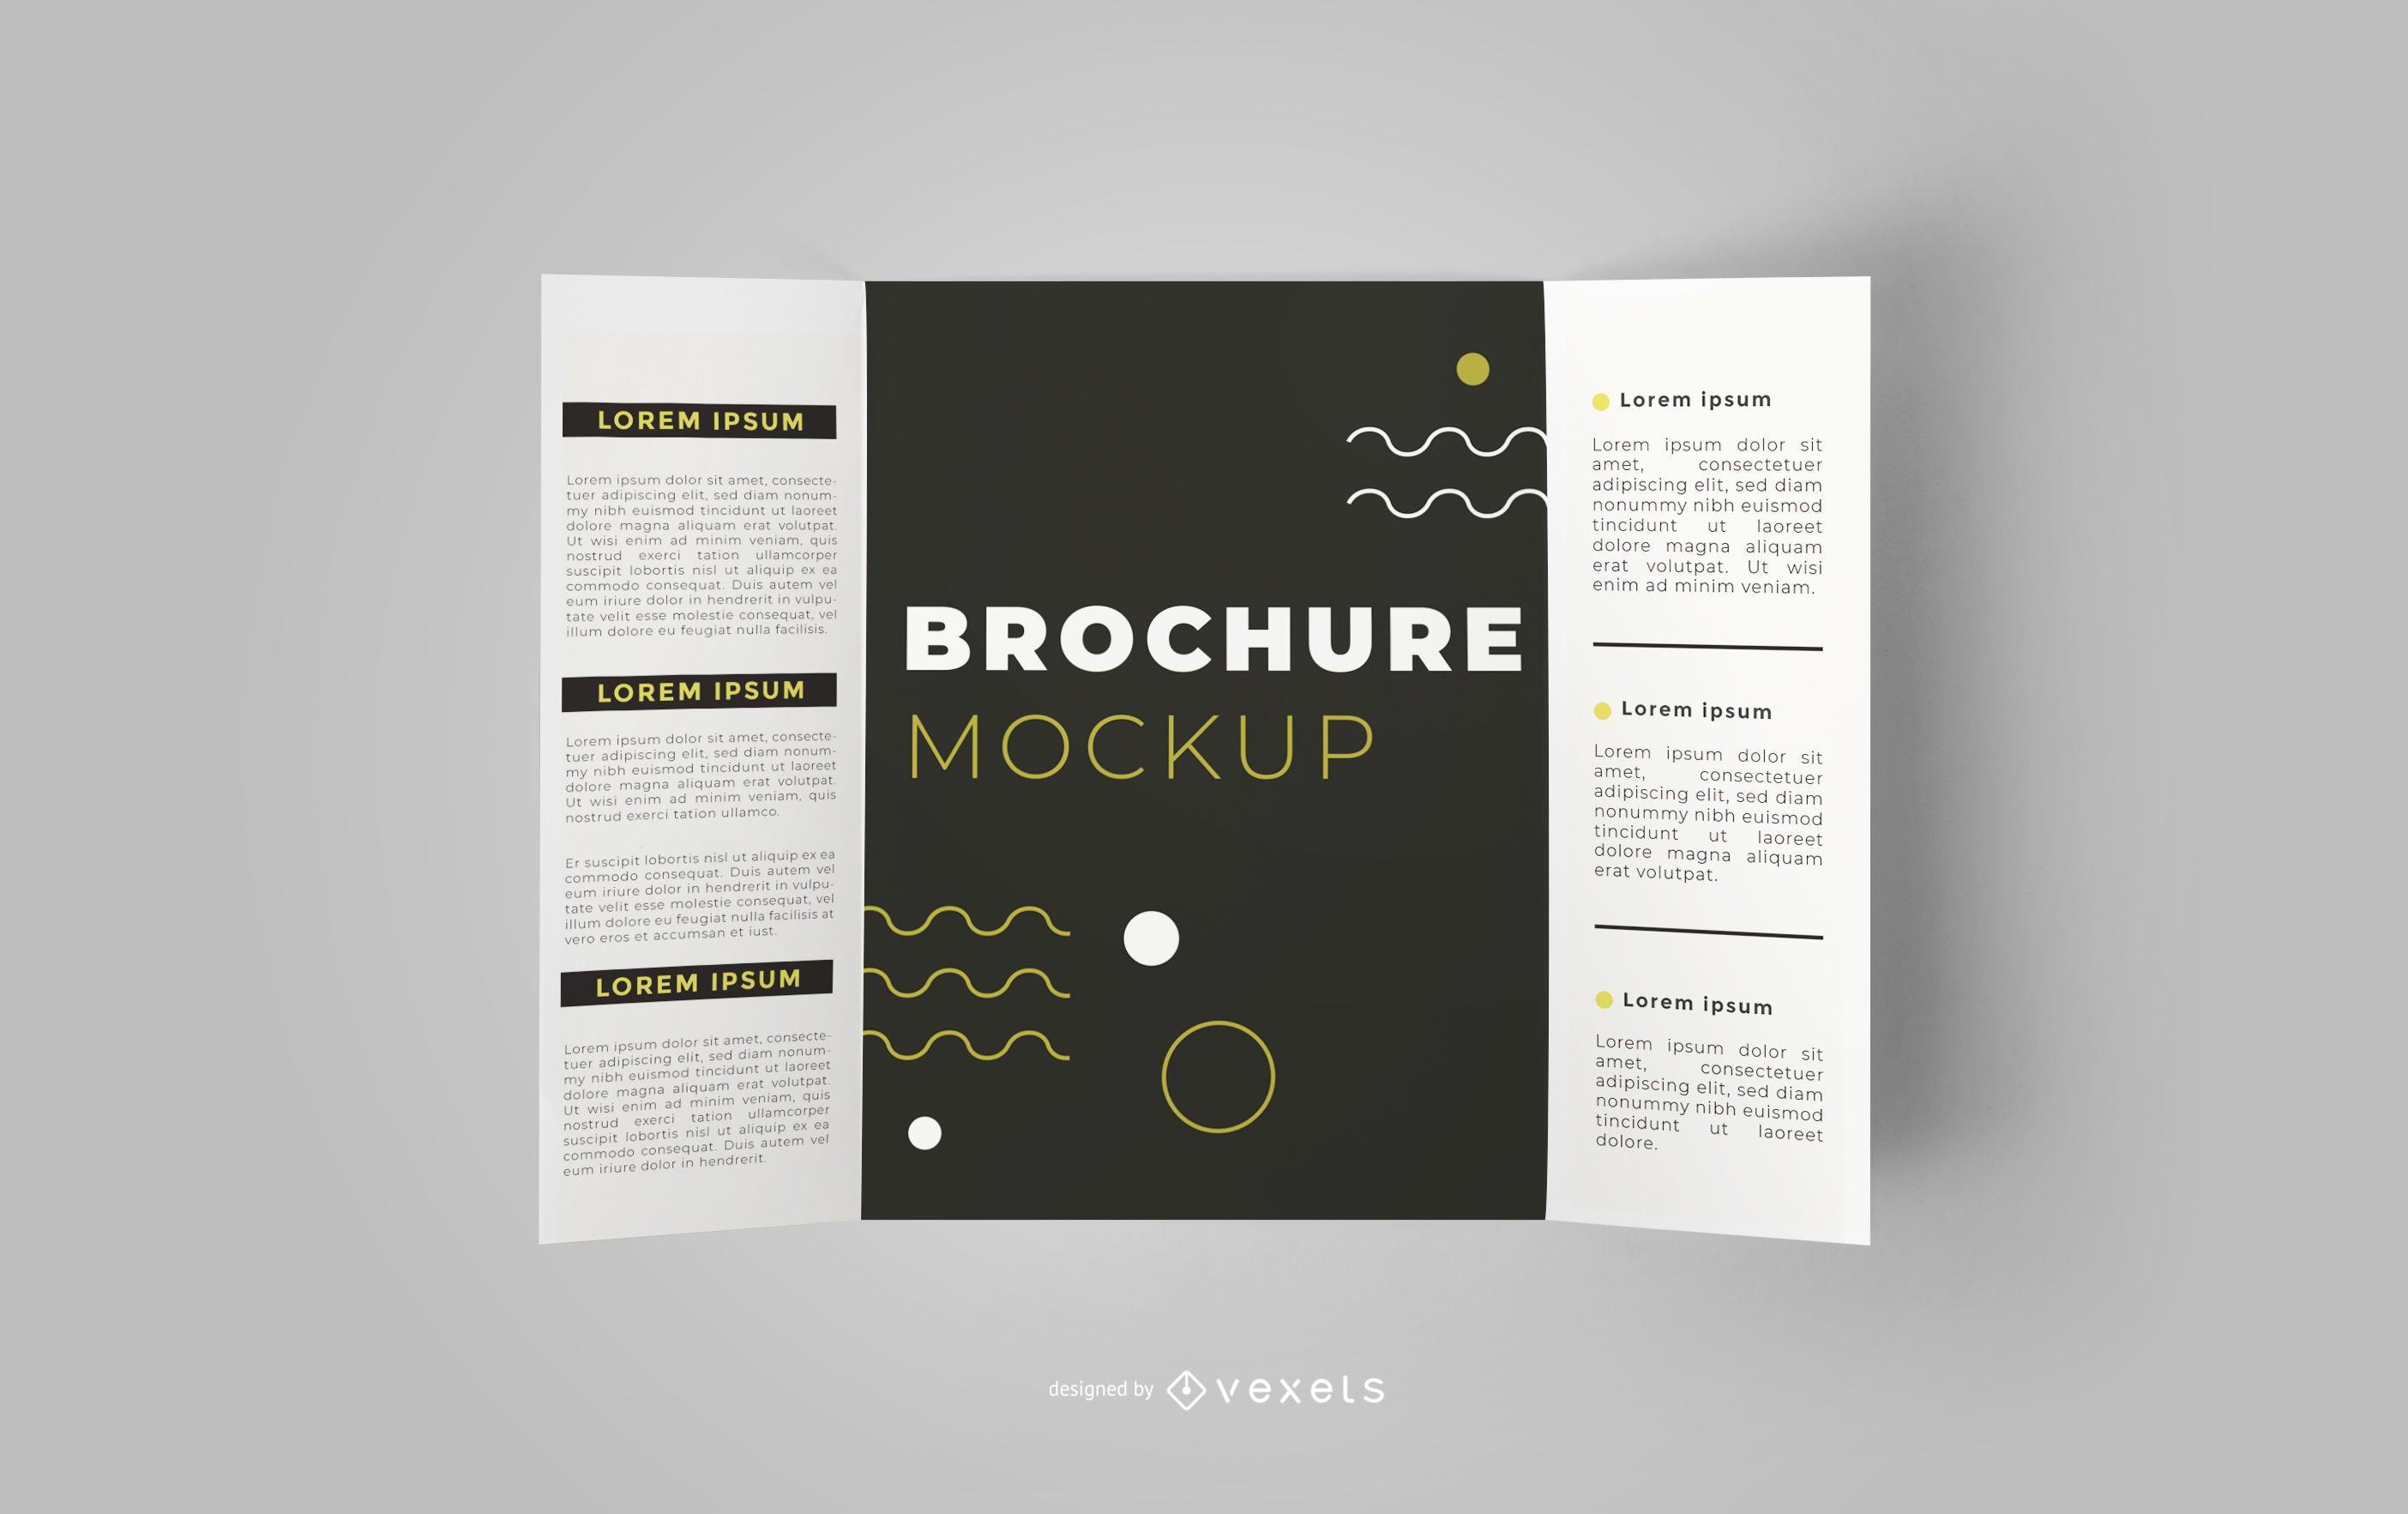 Open Brochure Editable Mockup Design